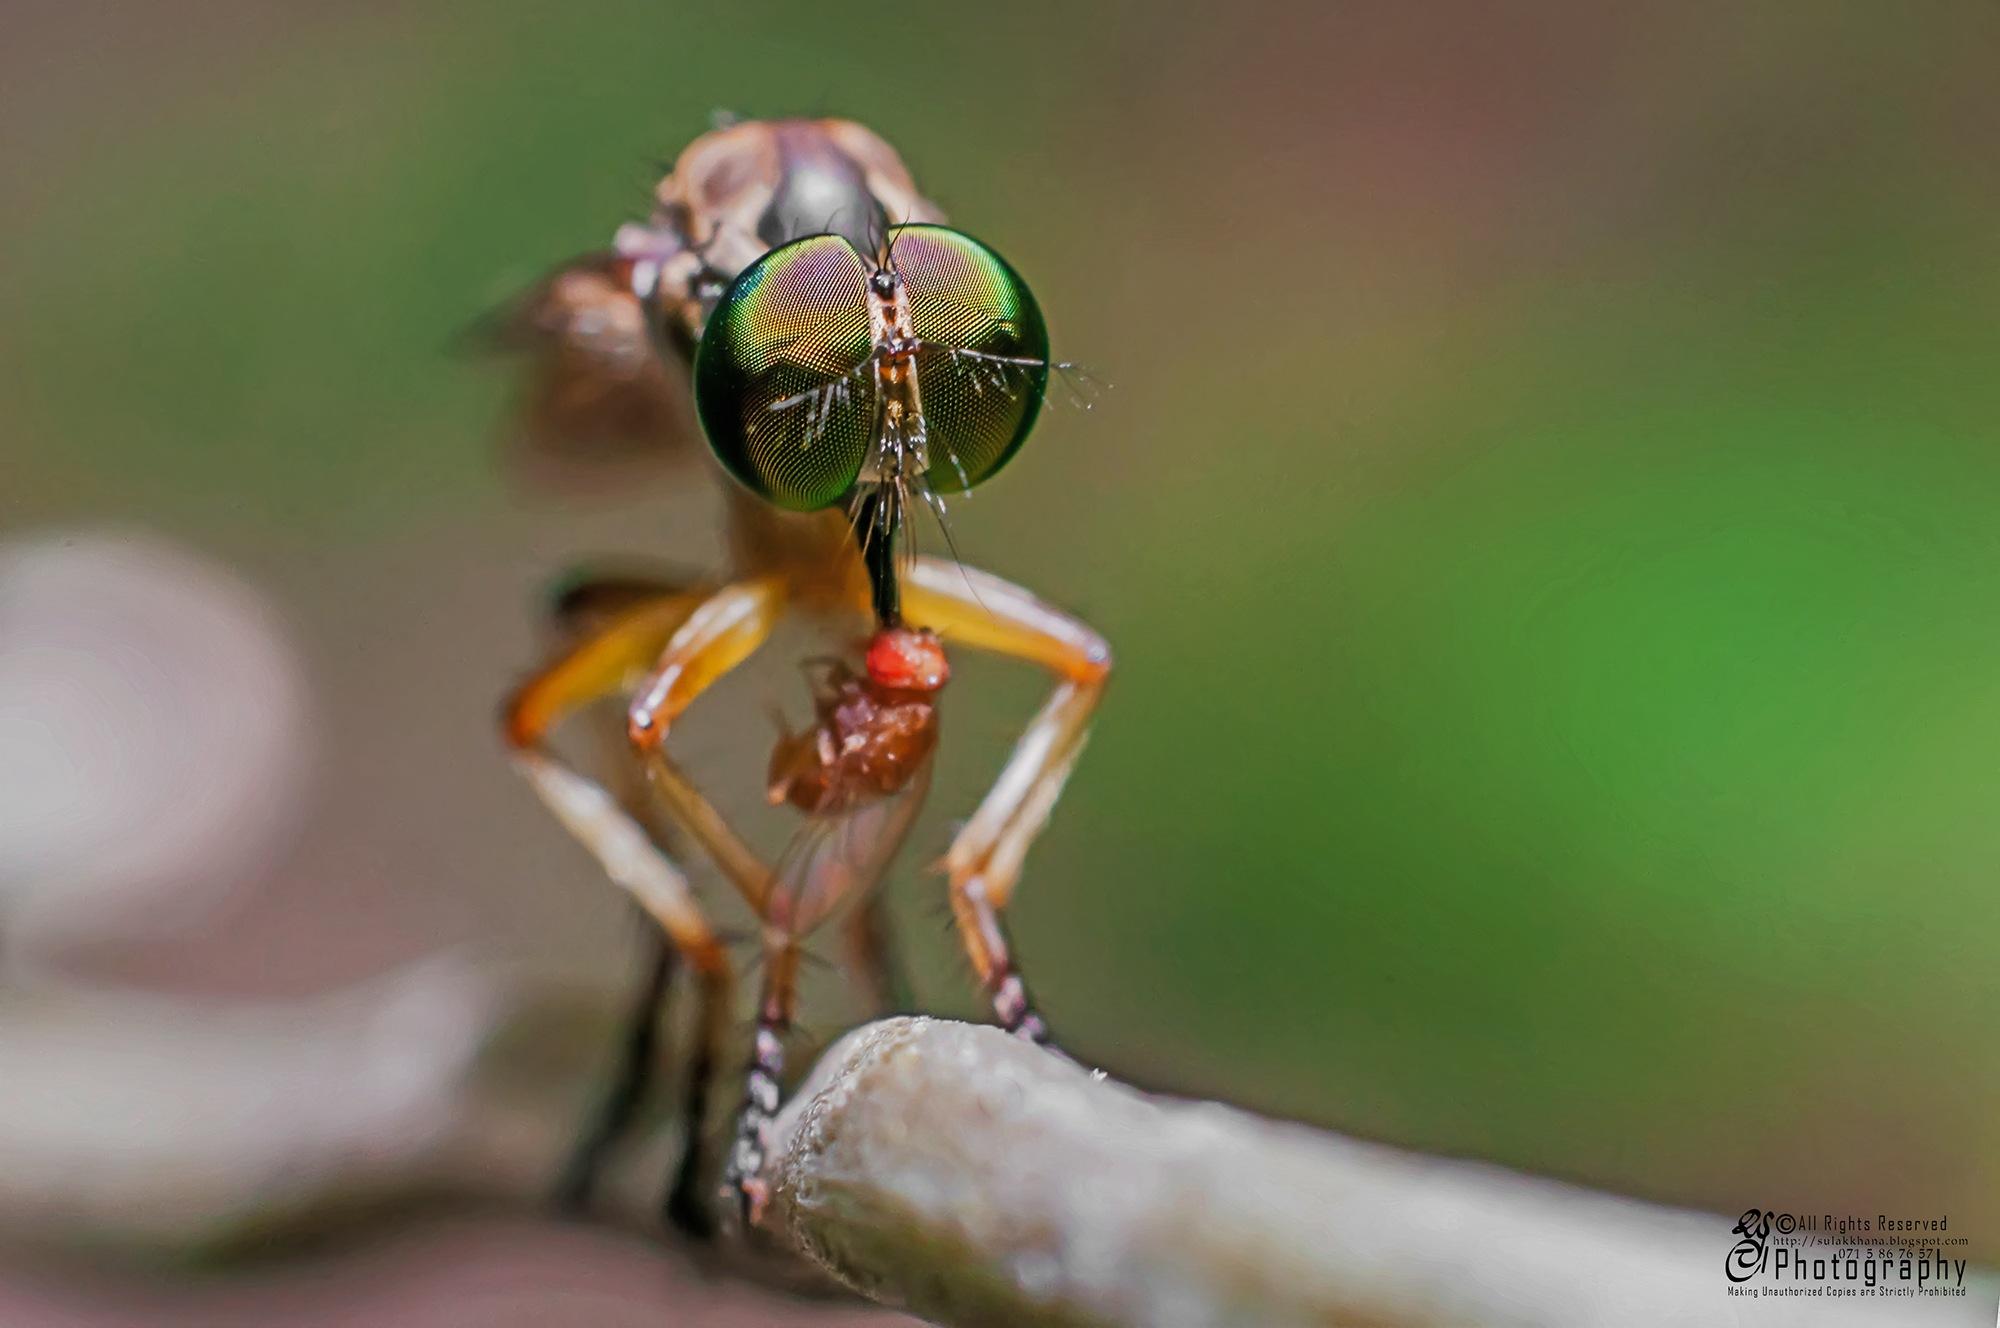 RobberFly Prays on Fruit Fly by Sulakkhana Chamara